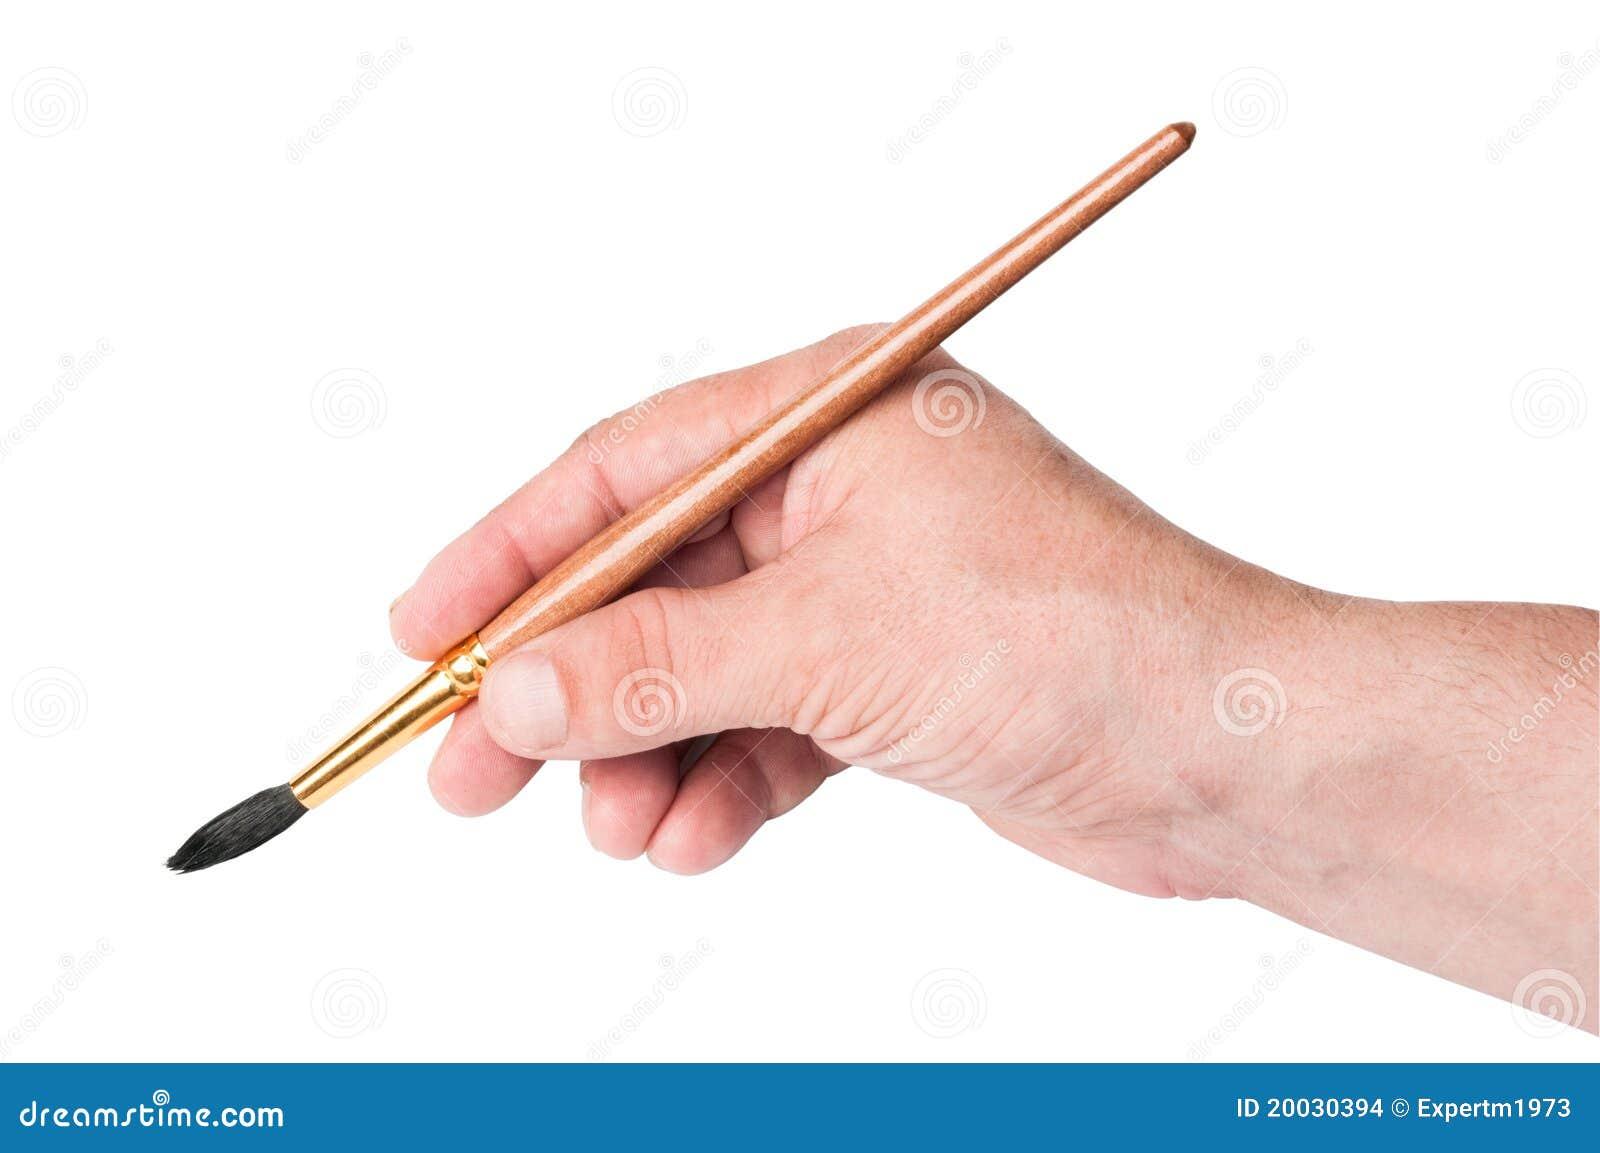 Hand Holding Paint Brush Clipart